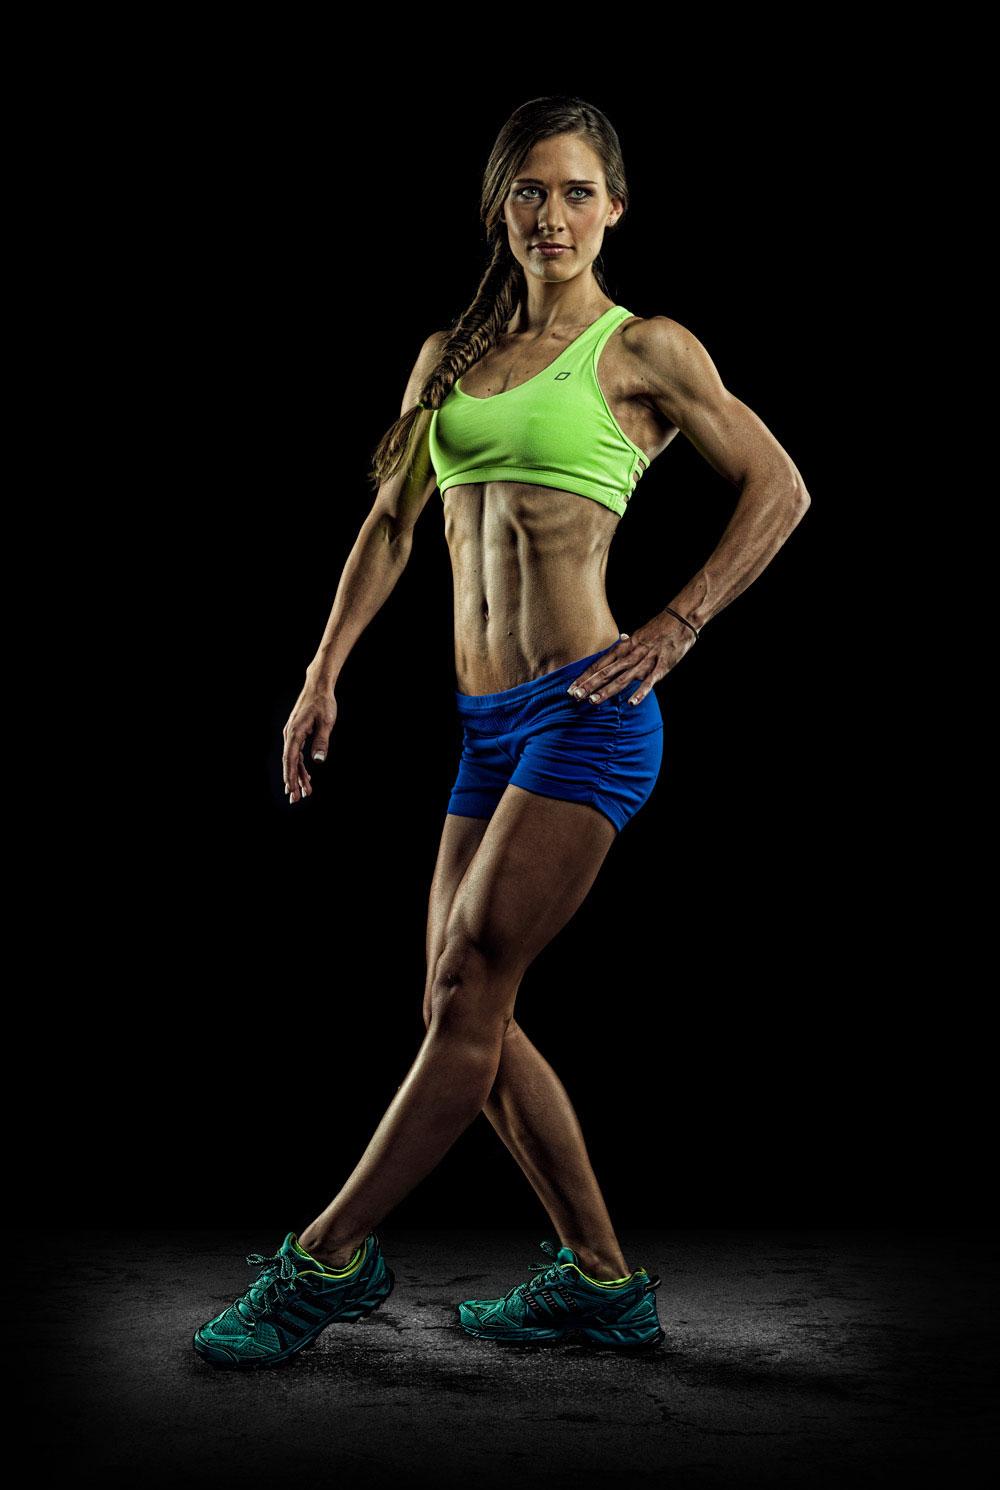 leilani-fitness-photography-front-side-on-black-brandon-barnard-professional-photographer.jpg